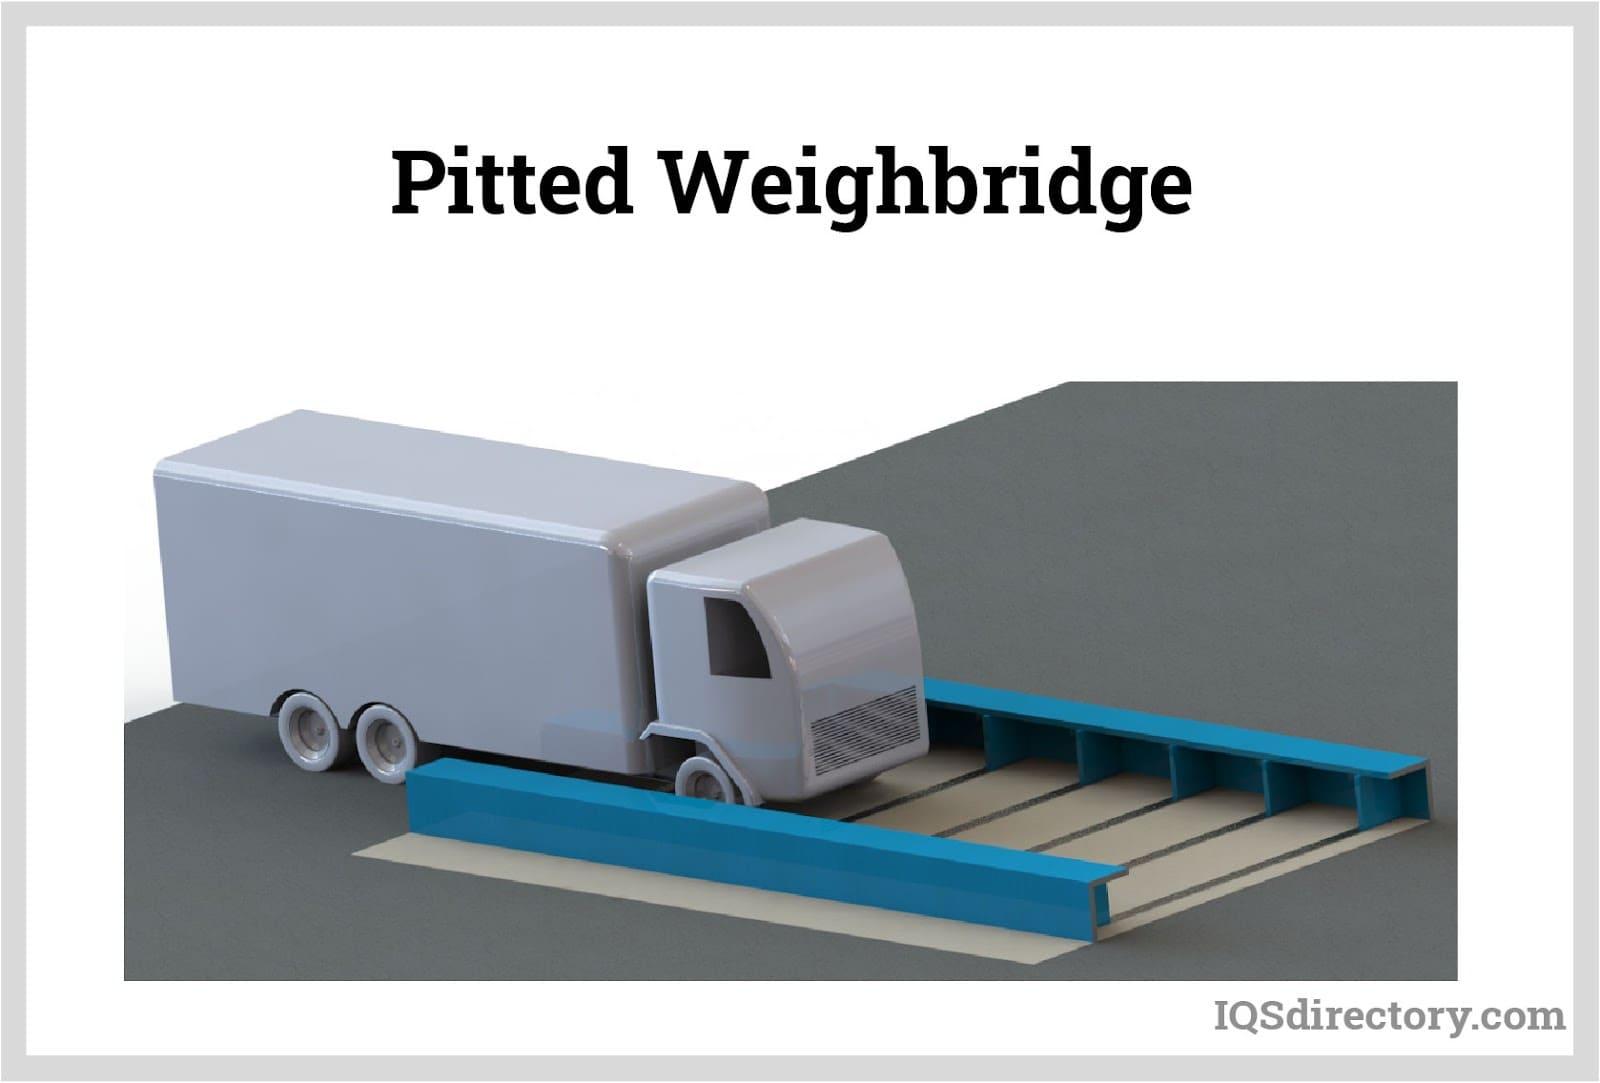 Pitted Weighbridge